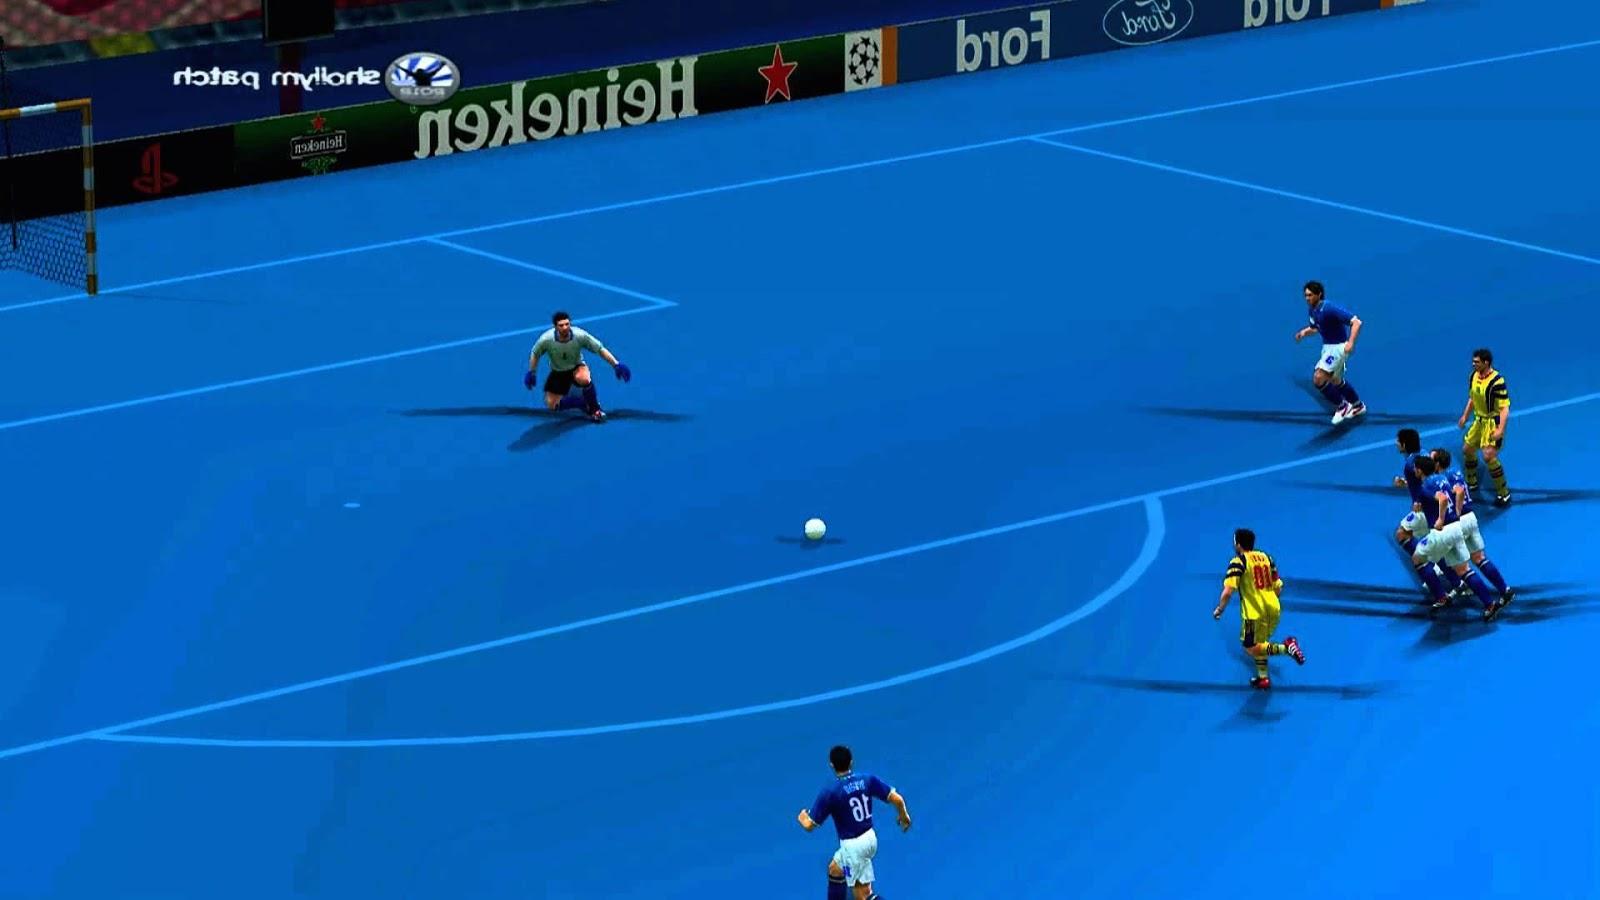 Futsal Football 2015 v2.0 .apk File